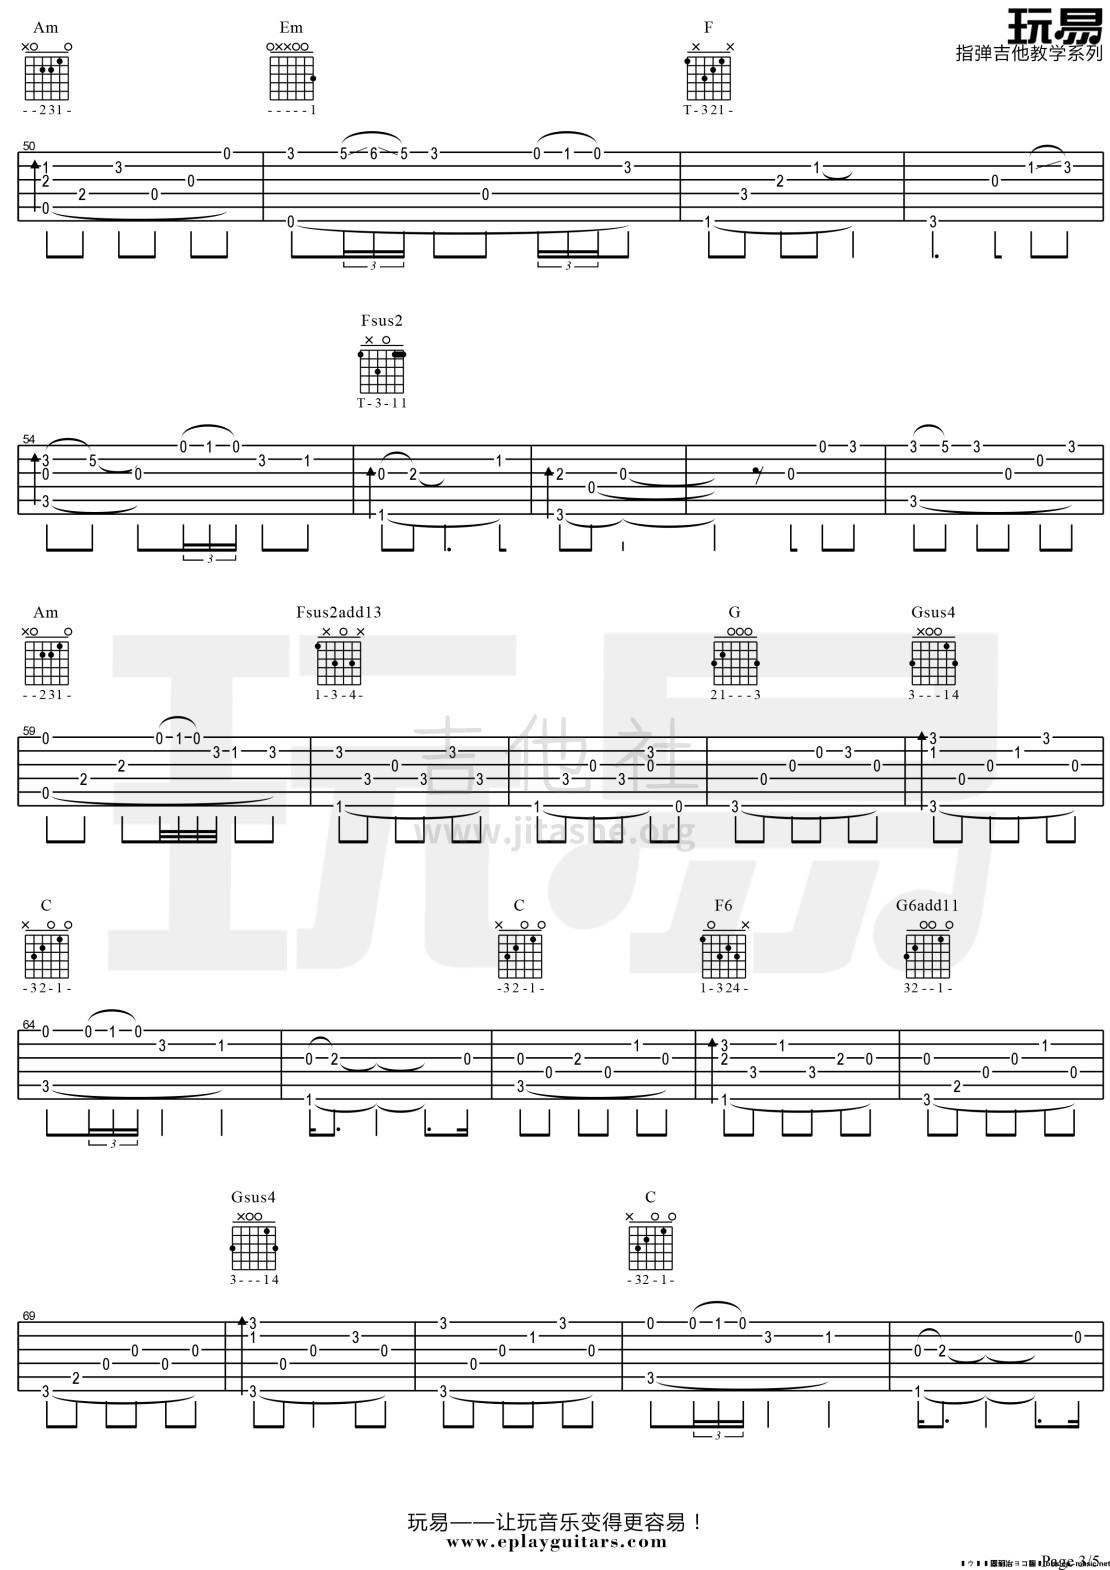 The Immigrant(玩易指弹吉他教学系列)吉他谱(图片谱,指弹,教学,玩易指弹教学)_Joanie Madden(乔妮·梅登)_The  lmmigrant 3.jpg